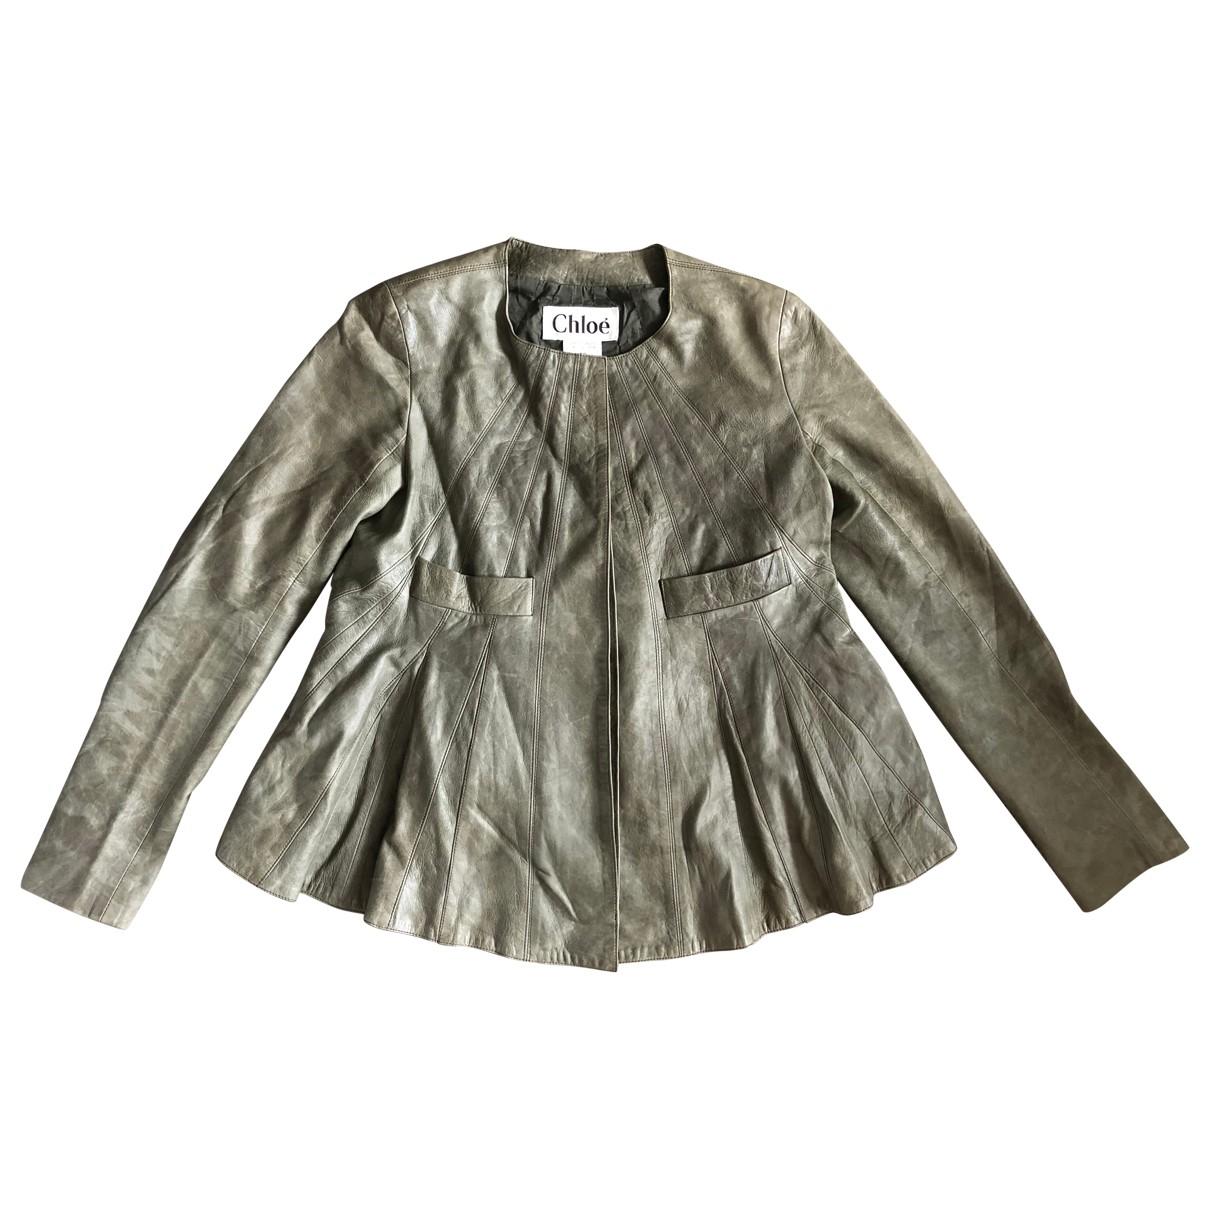 Chloé \N Khaki Leather jacket for Women 36 FR